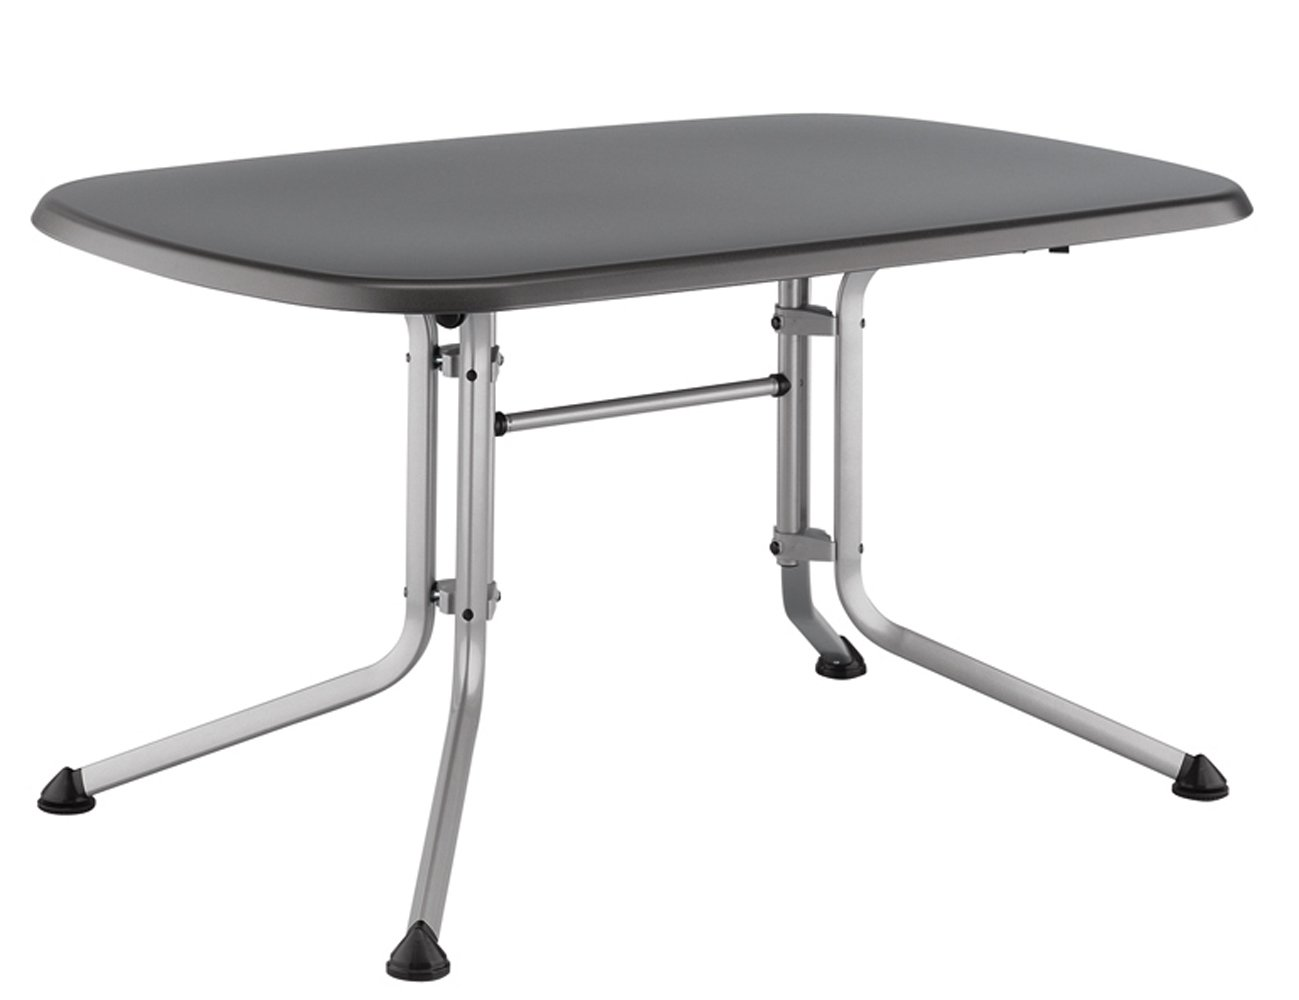 kettler gartentisch oval 140x90cm silber eisengrau aluminiumgestell silber kettalux plus. Black Bedroom Furniture Sets. Home Design Ideas